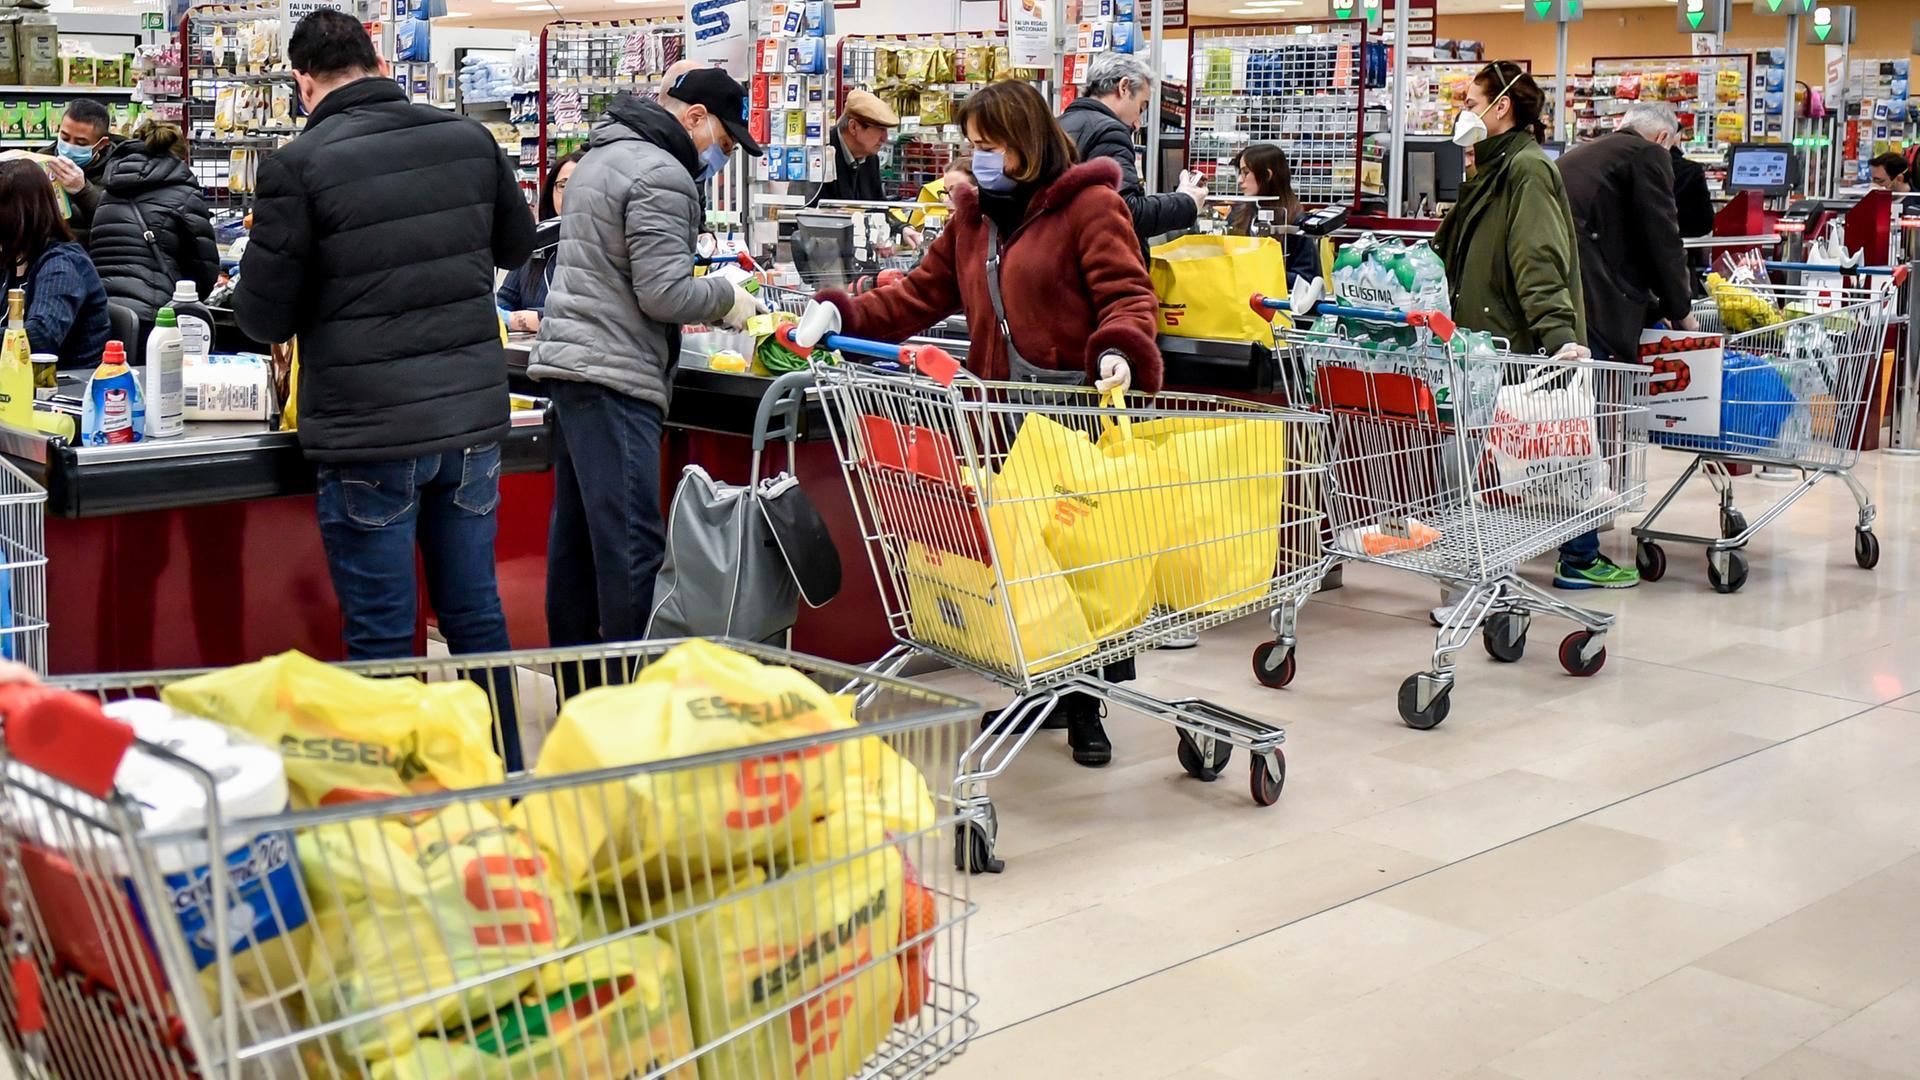 Ganz Italien Nun Schutzzone Kampf Gegen Corona Hamsterkaufe Und Leere Stadte Zdfheute